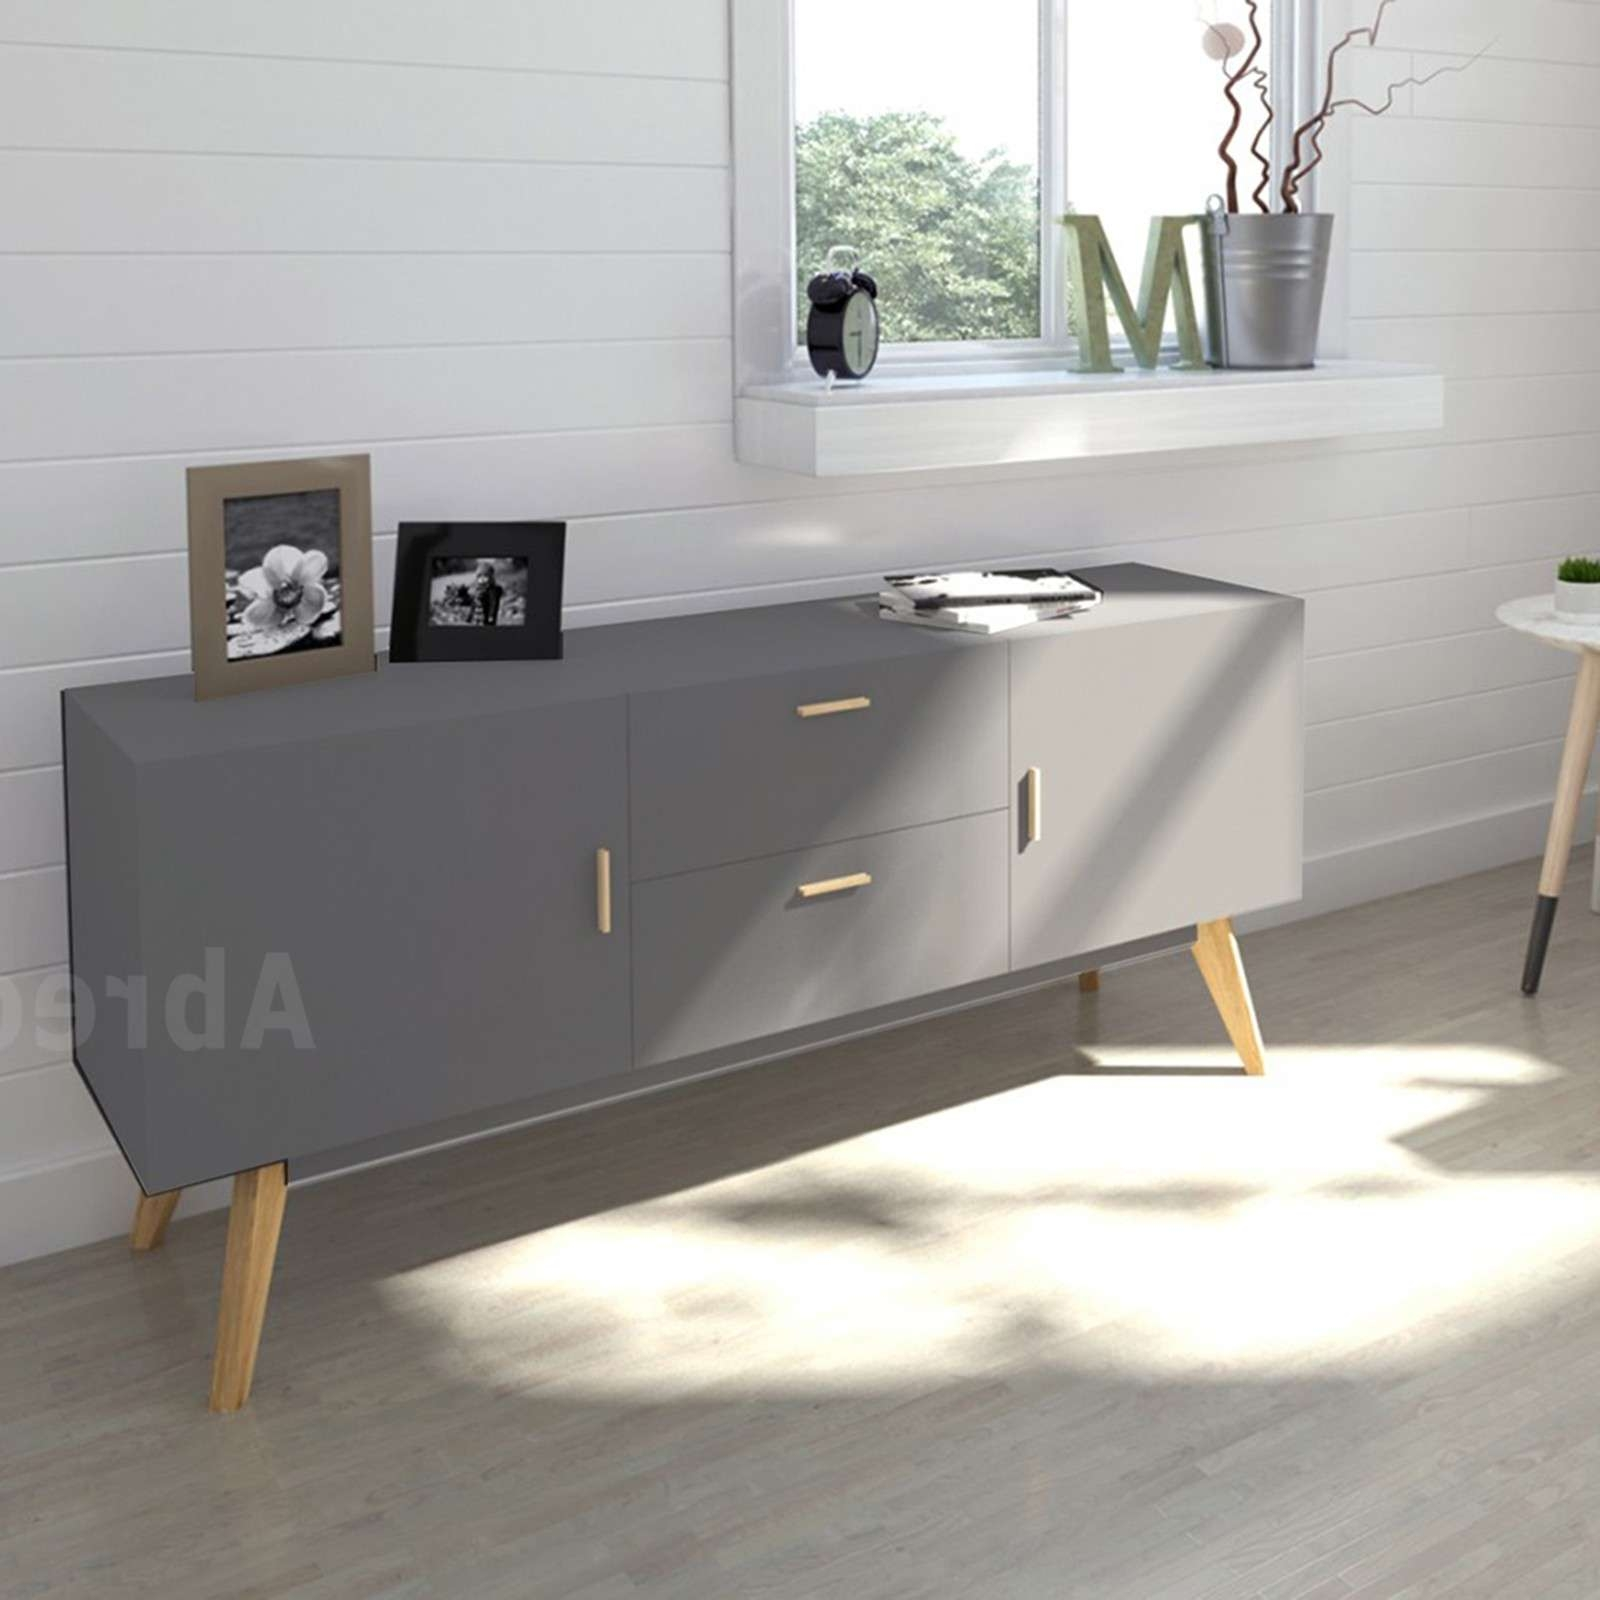 Scandinavian Retro Style White Sideboard Abreo Home Furniture Regarding Scandinavian Sideboards (View 9 of 20)